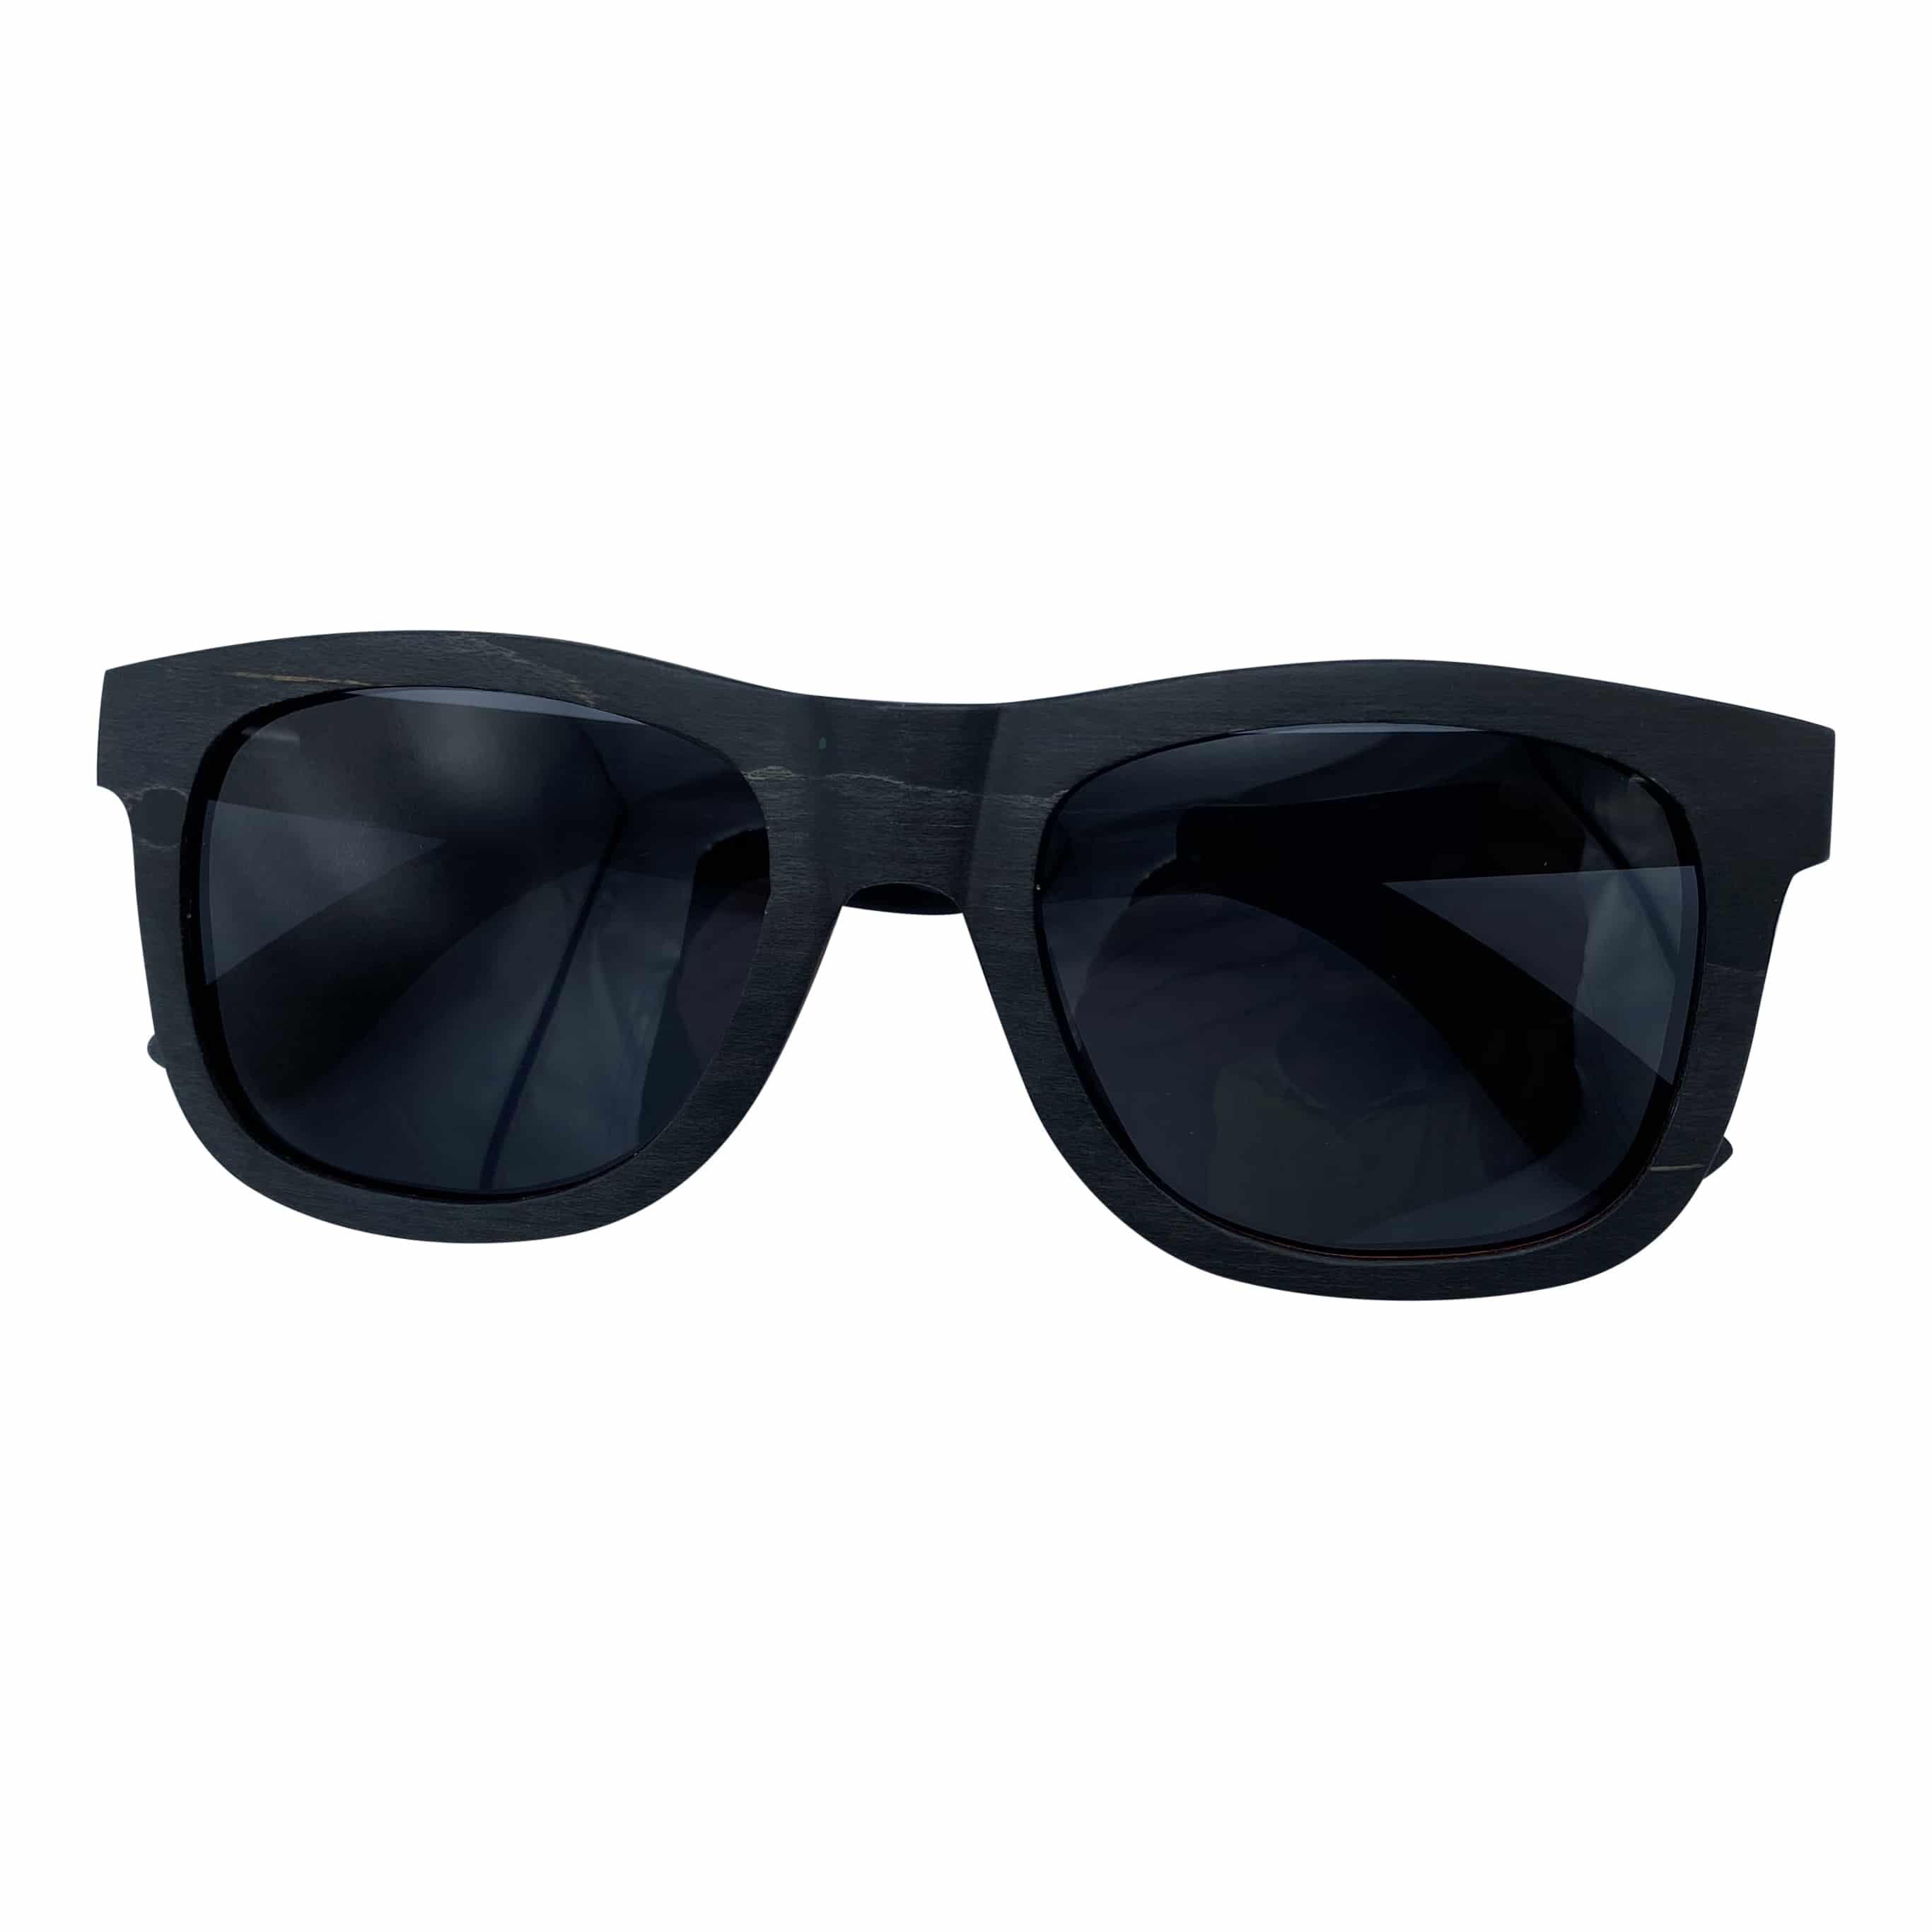 5one® wayfarer 2.0 Black/Red - houten Zonnebril - Grijze lens